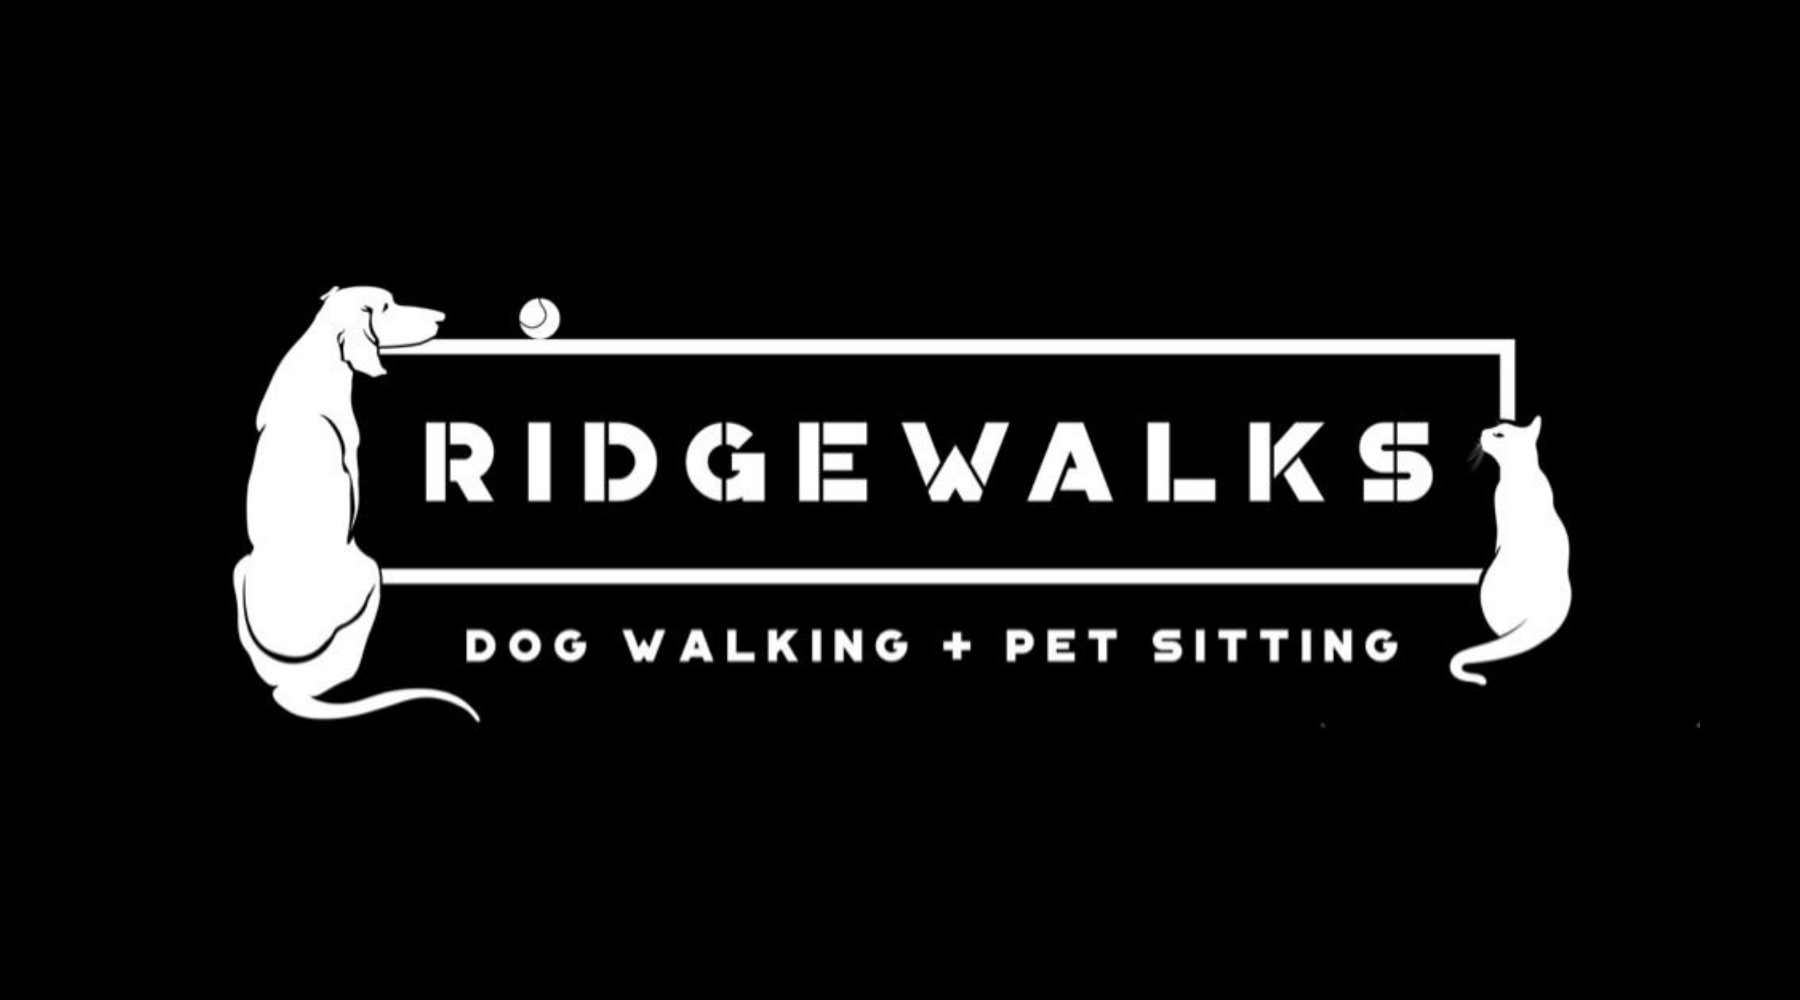 RidgeWalks-Summary-image.png